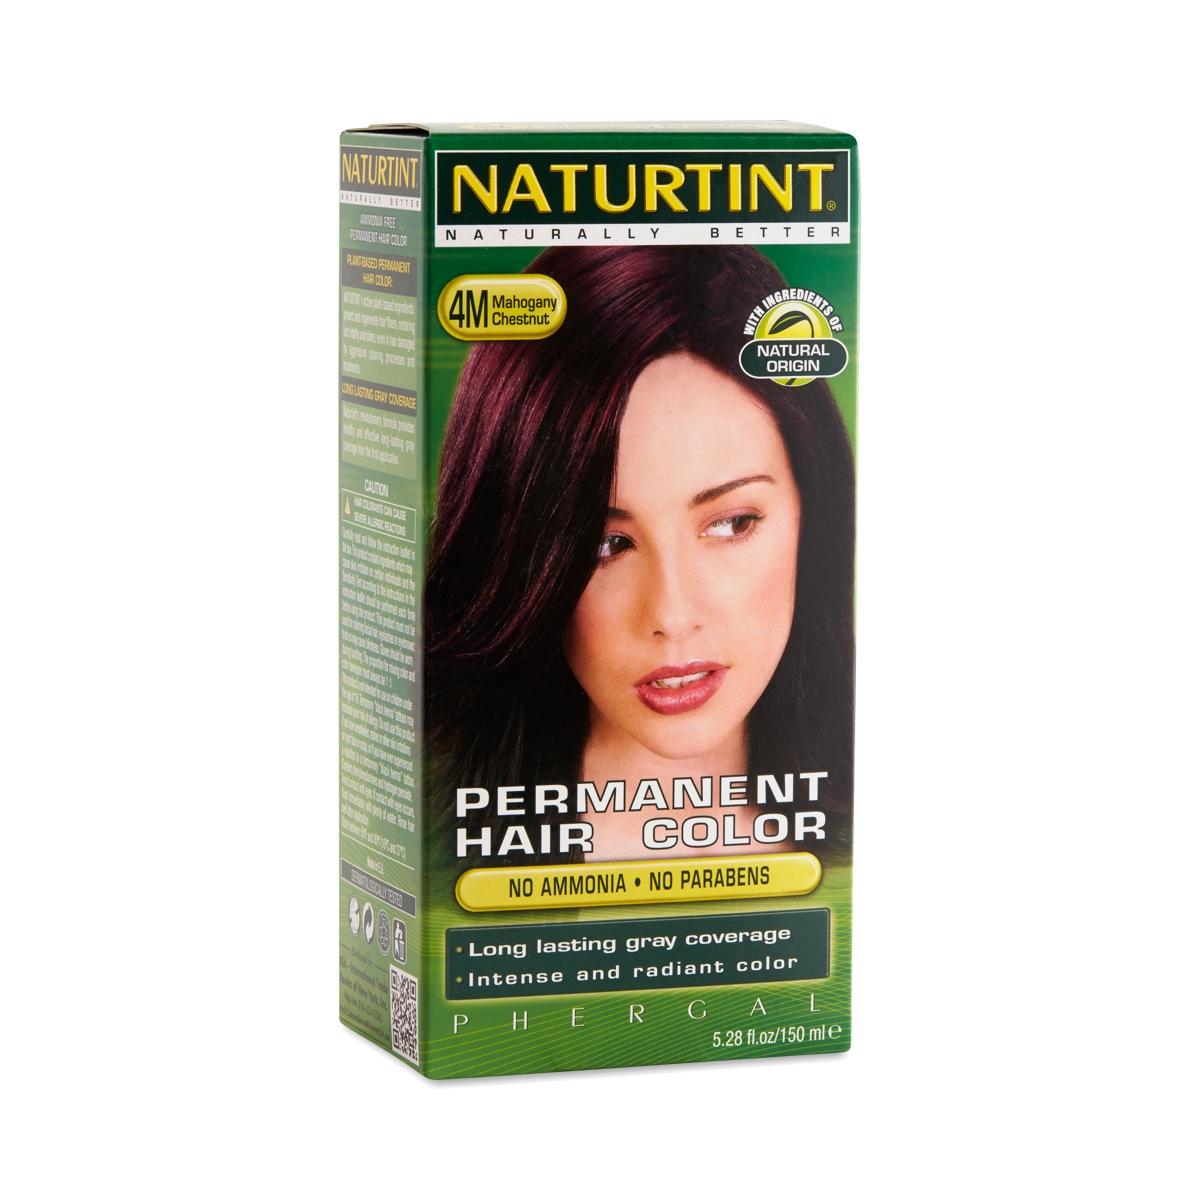 Naturtint Permanent Hair Color Mahogany Chestnut 4m One Box